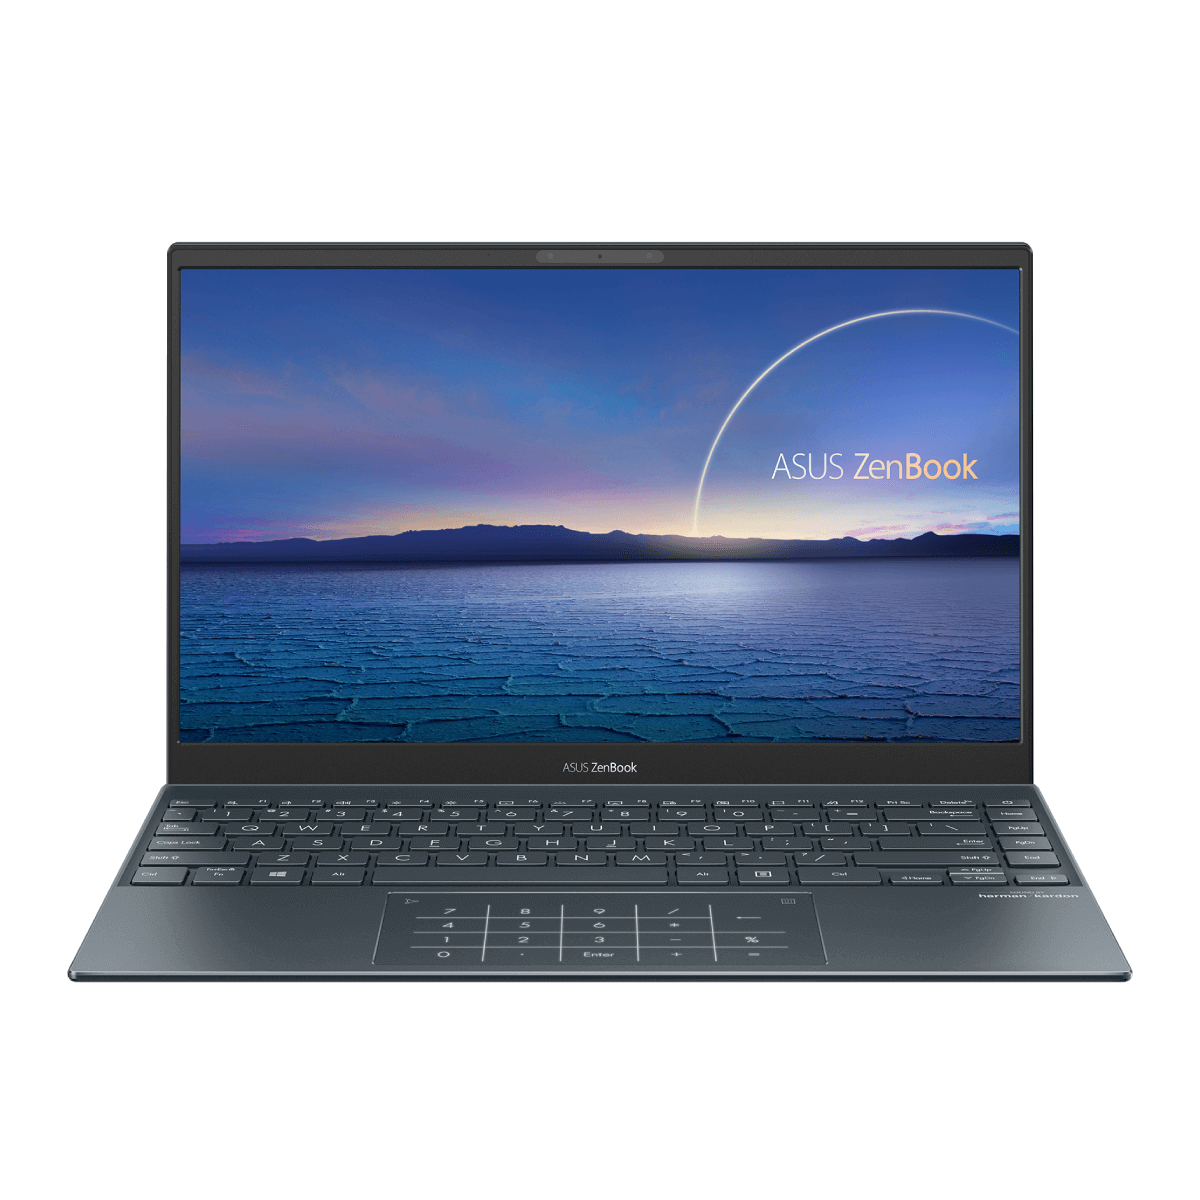 ASUS ZenBook 13 (i5, Pine Grey)